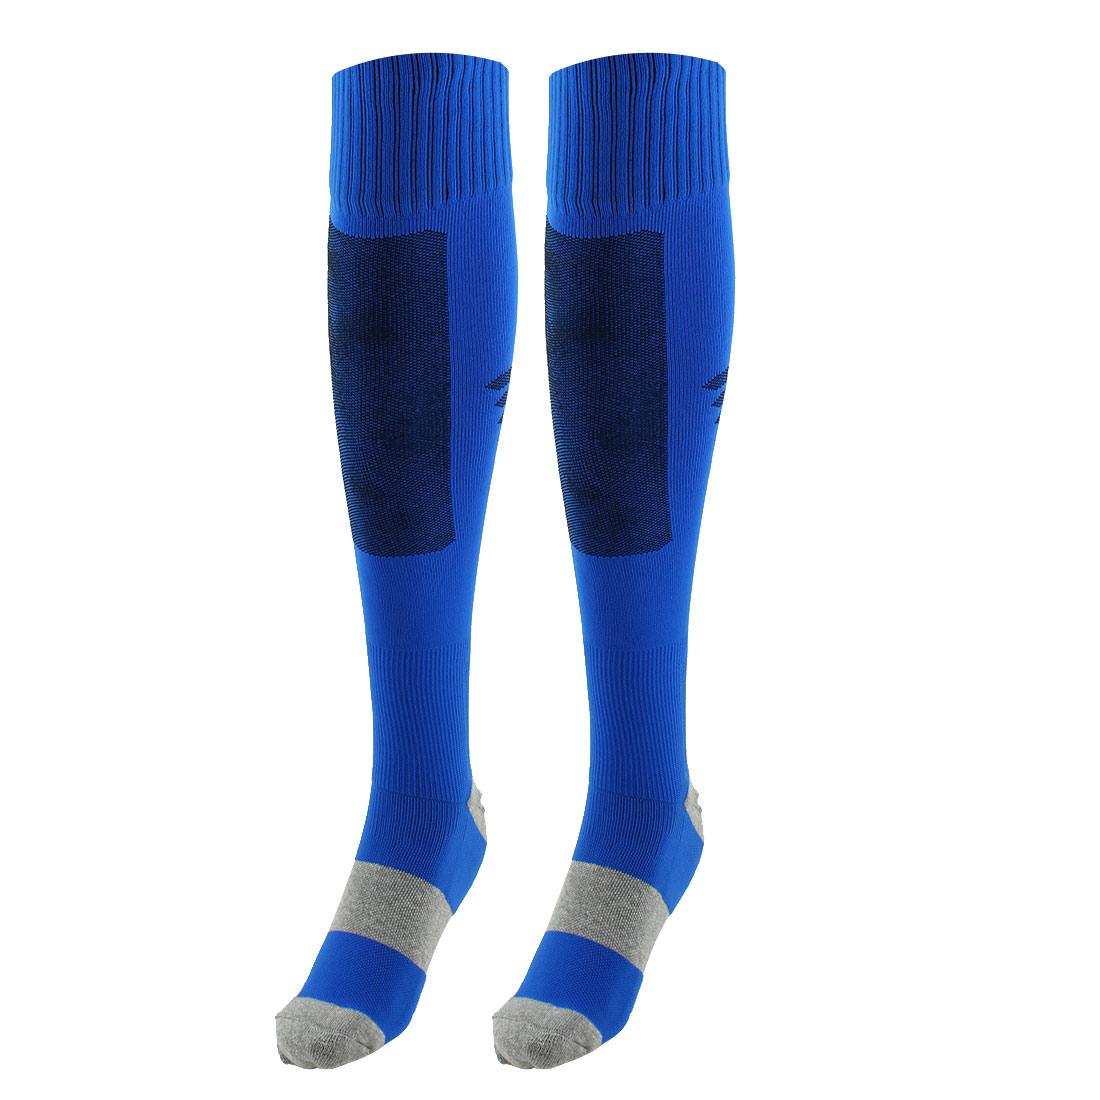 Unisex Outdoor Sports Nylon Non Slip Stretch Rugby Soccer Football Long Socks Blue Pair